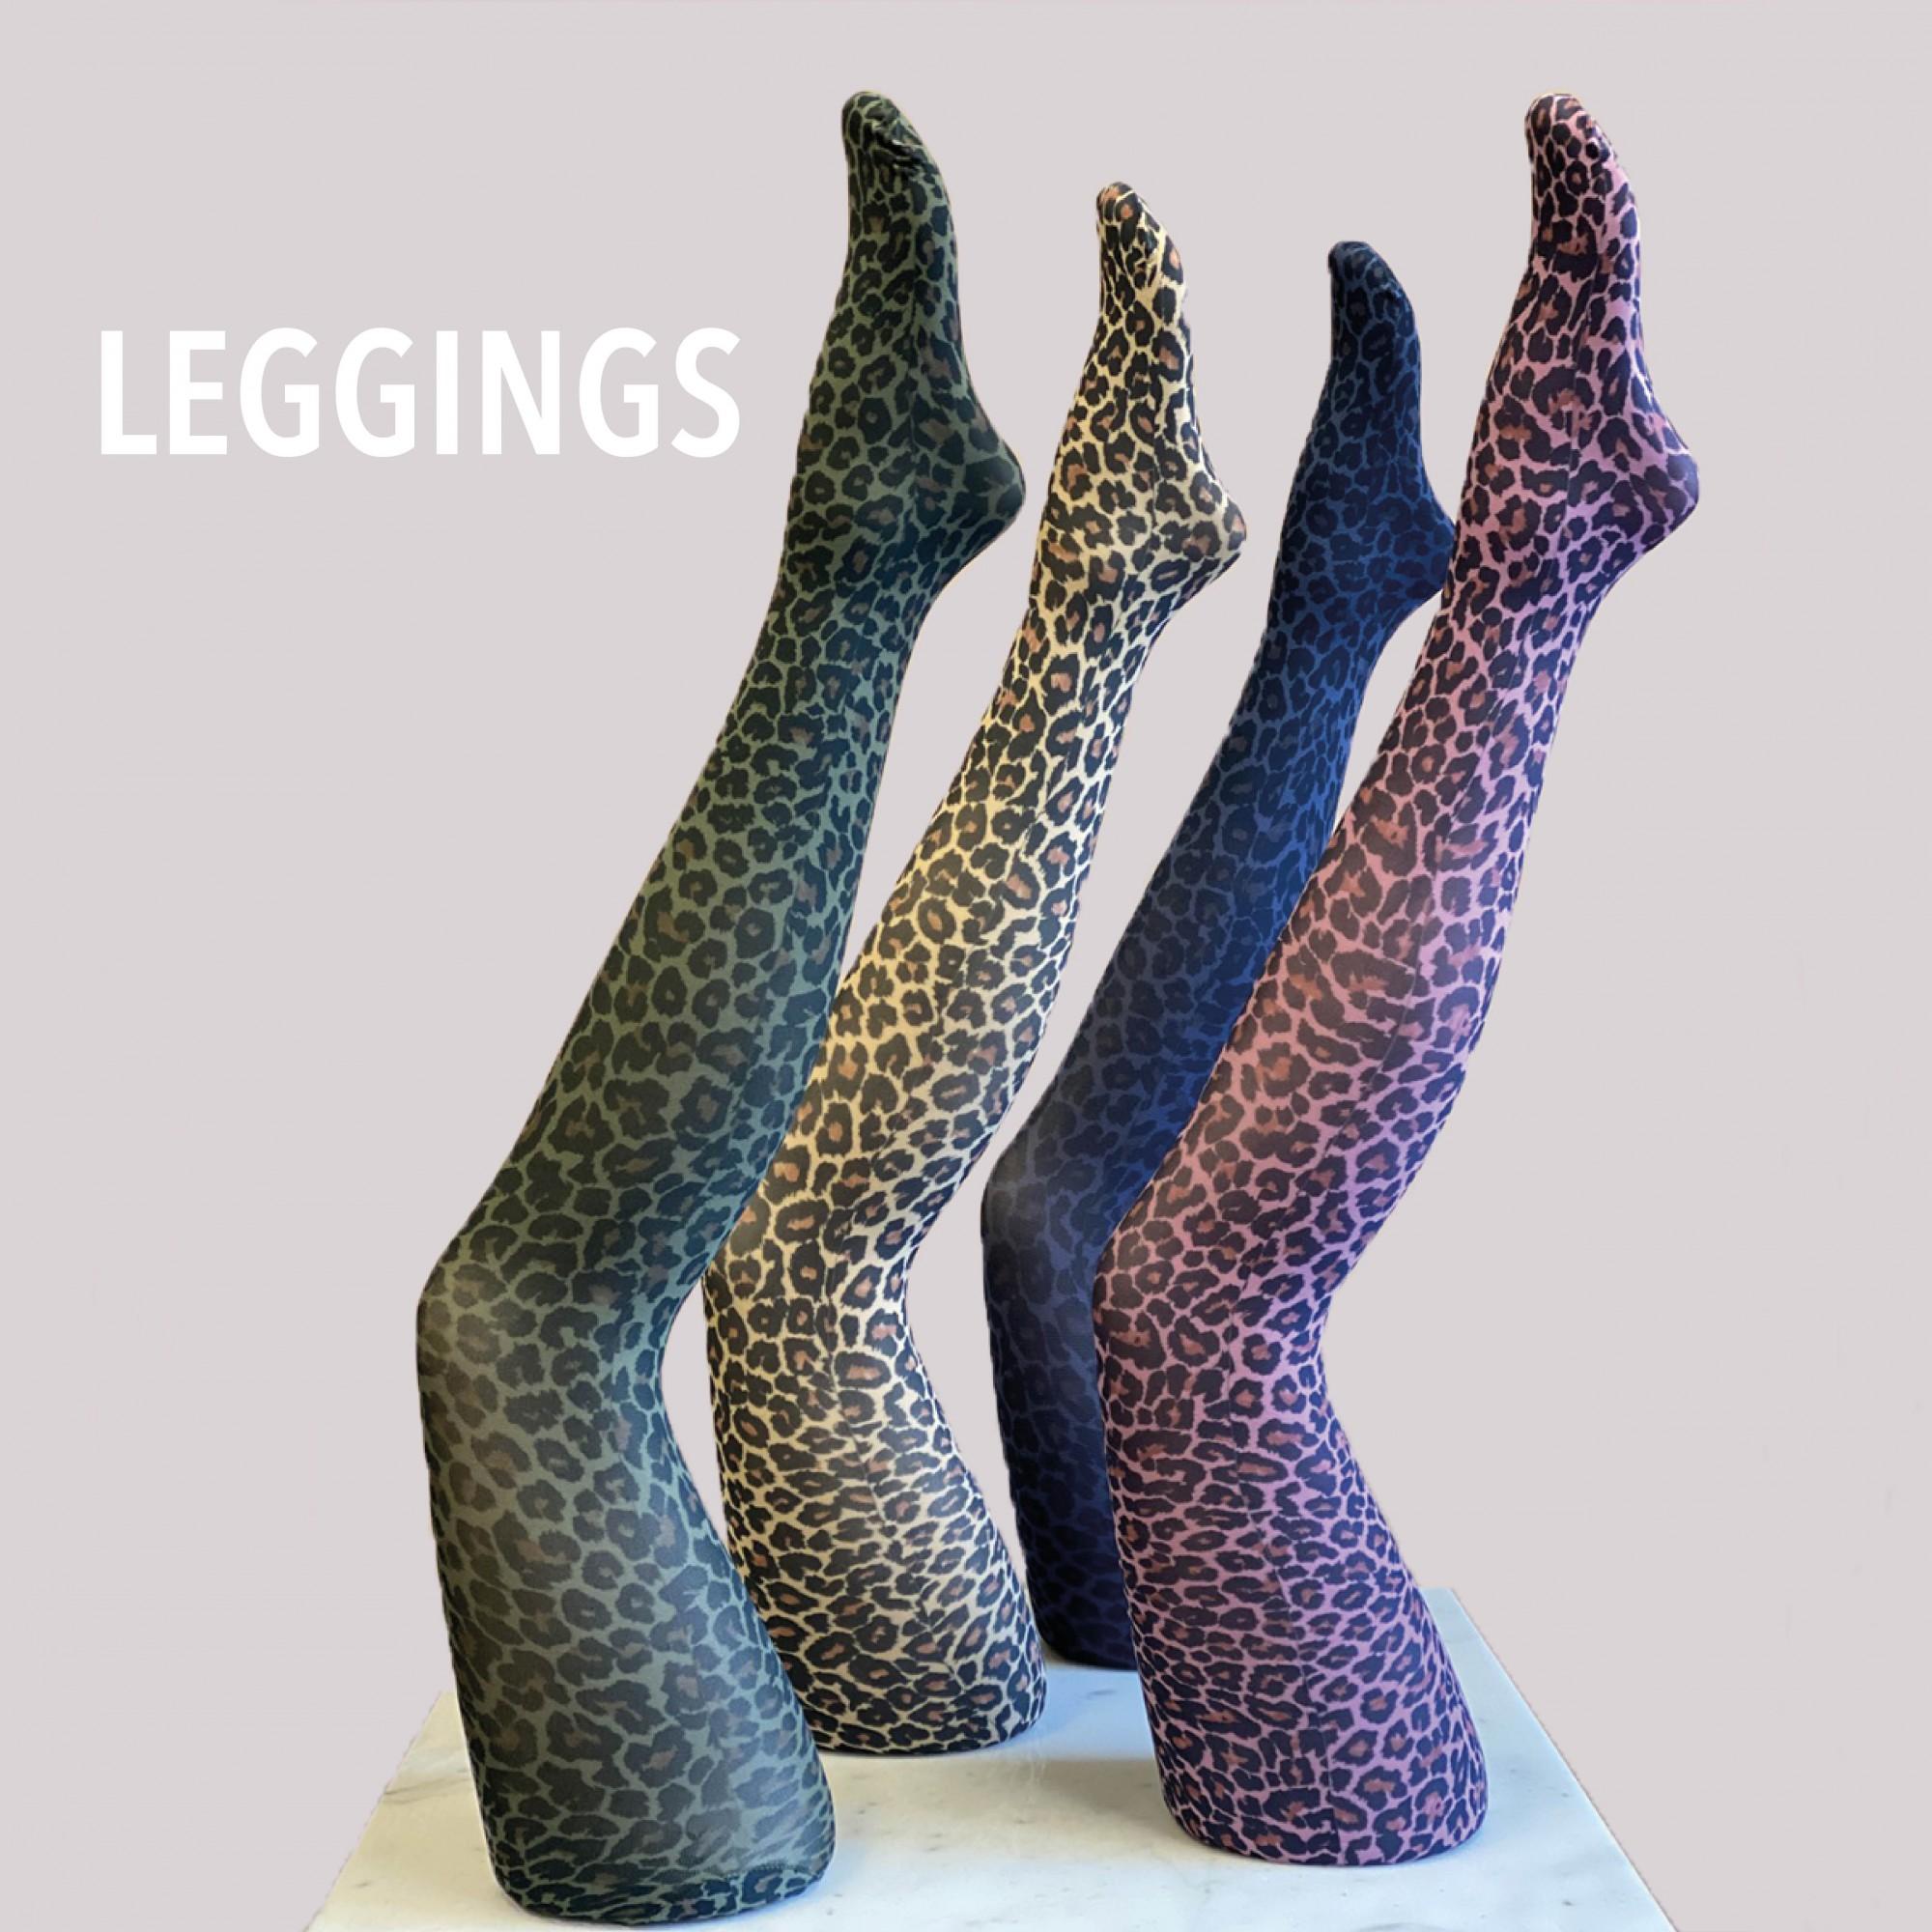 Leggings i forskellige farver og print